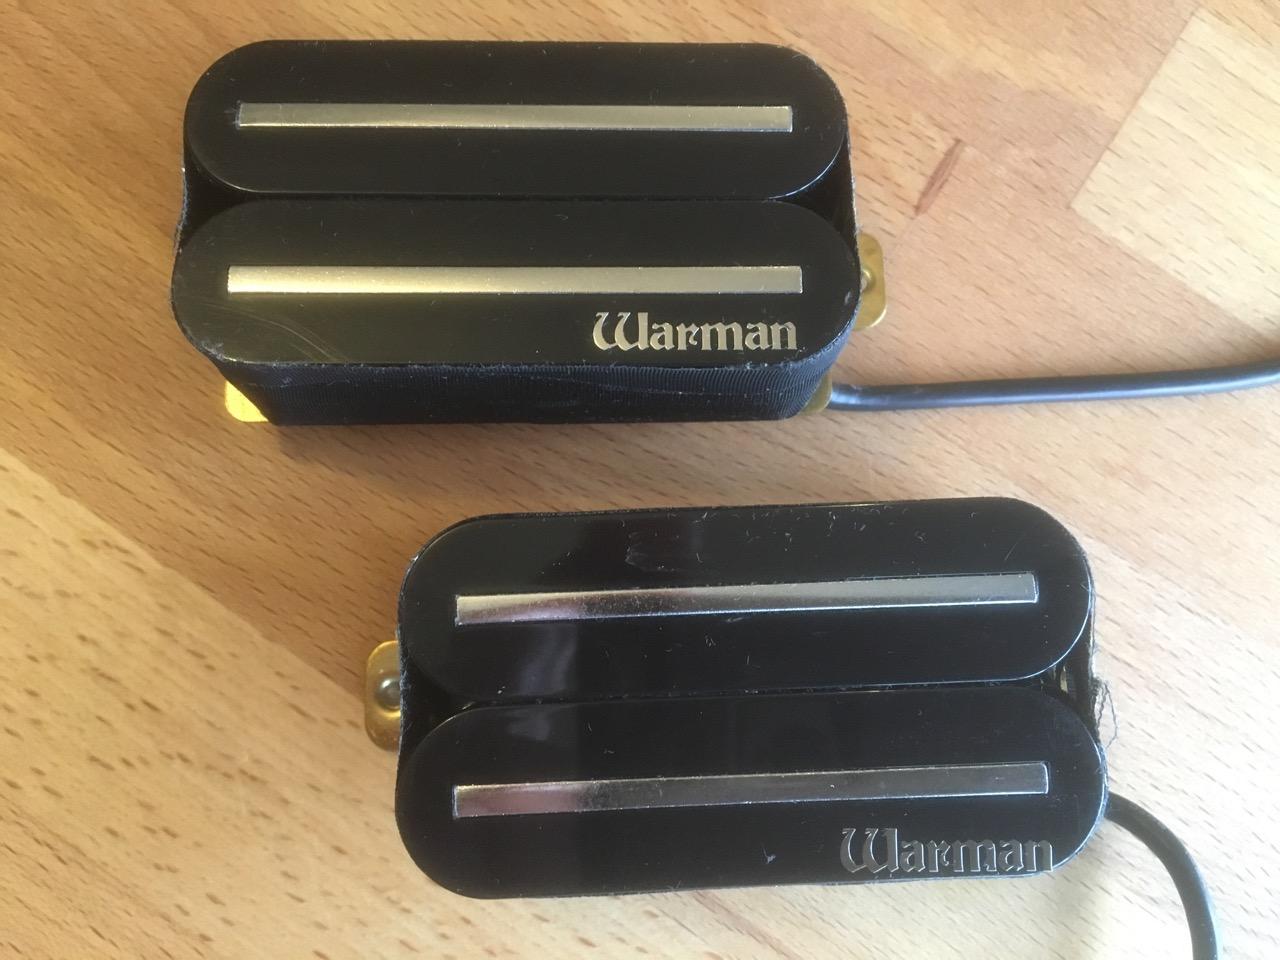 Warblades High Output Rail Humbuckers Warman Guitars Dual Hot Humbucker Neck Pickup 4 Wire For Electric Guitarin Cored Humbucking Pickups